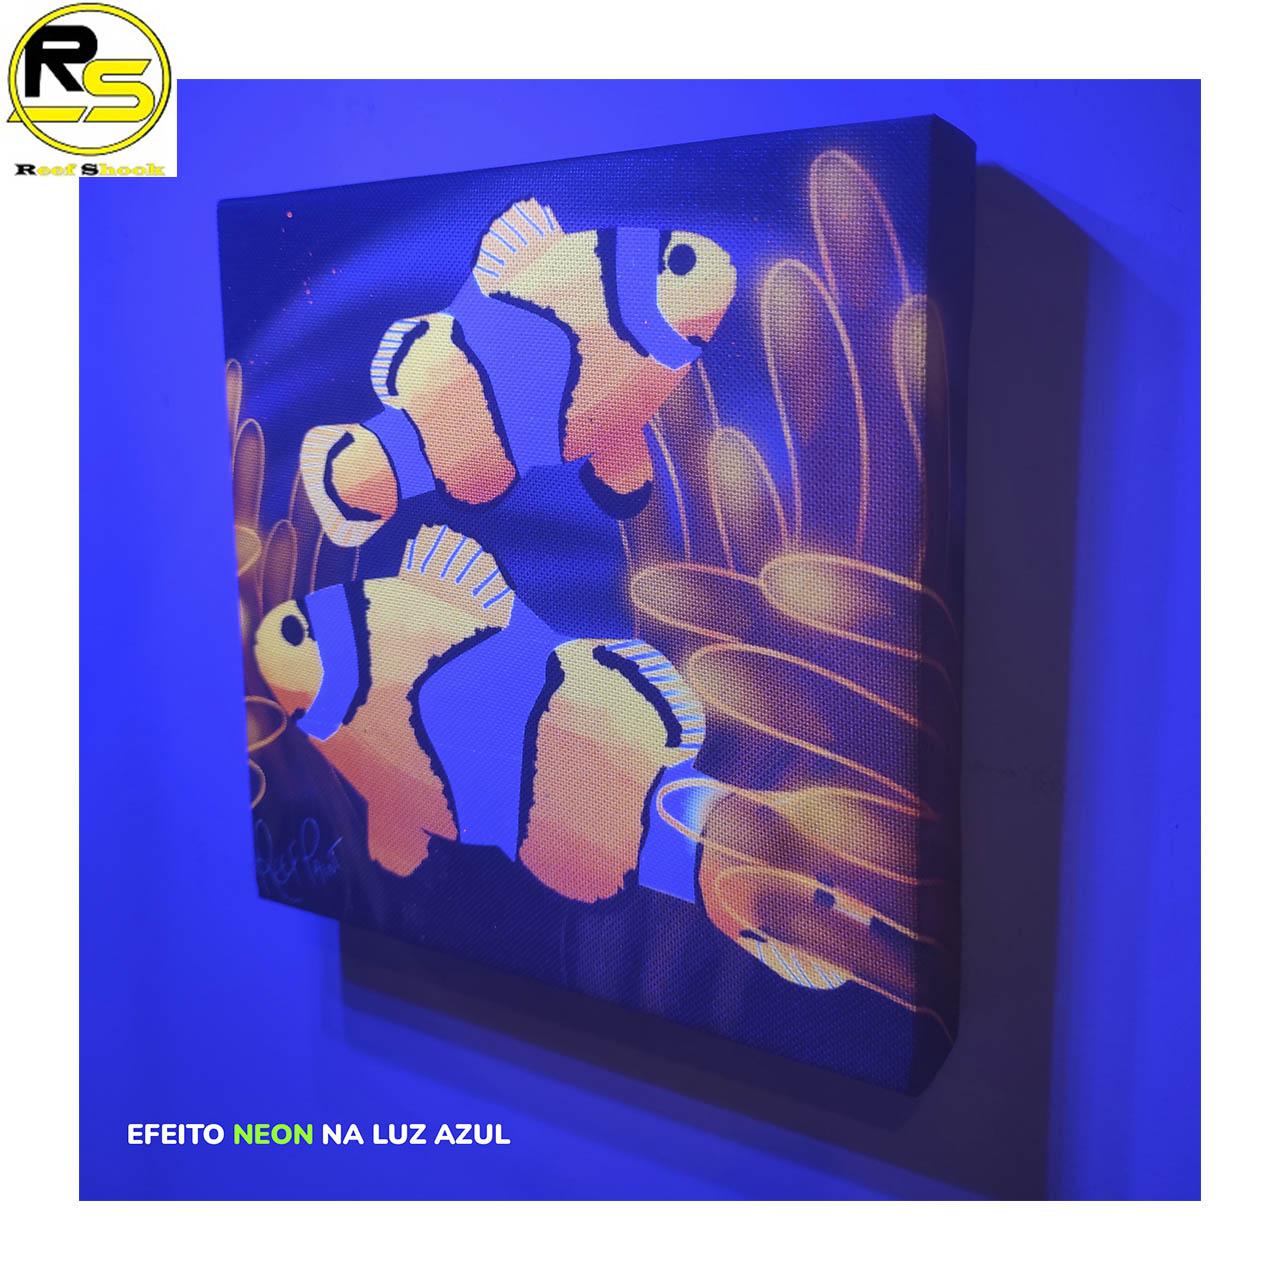 Quadro ReefPaint com tinta Neon 1101 Dois Ocellaris em Anêmona Brilhante